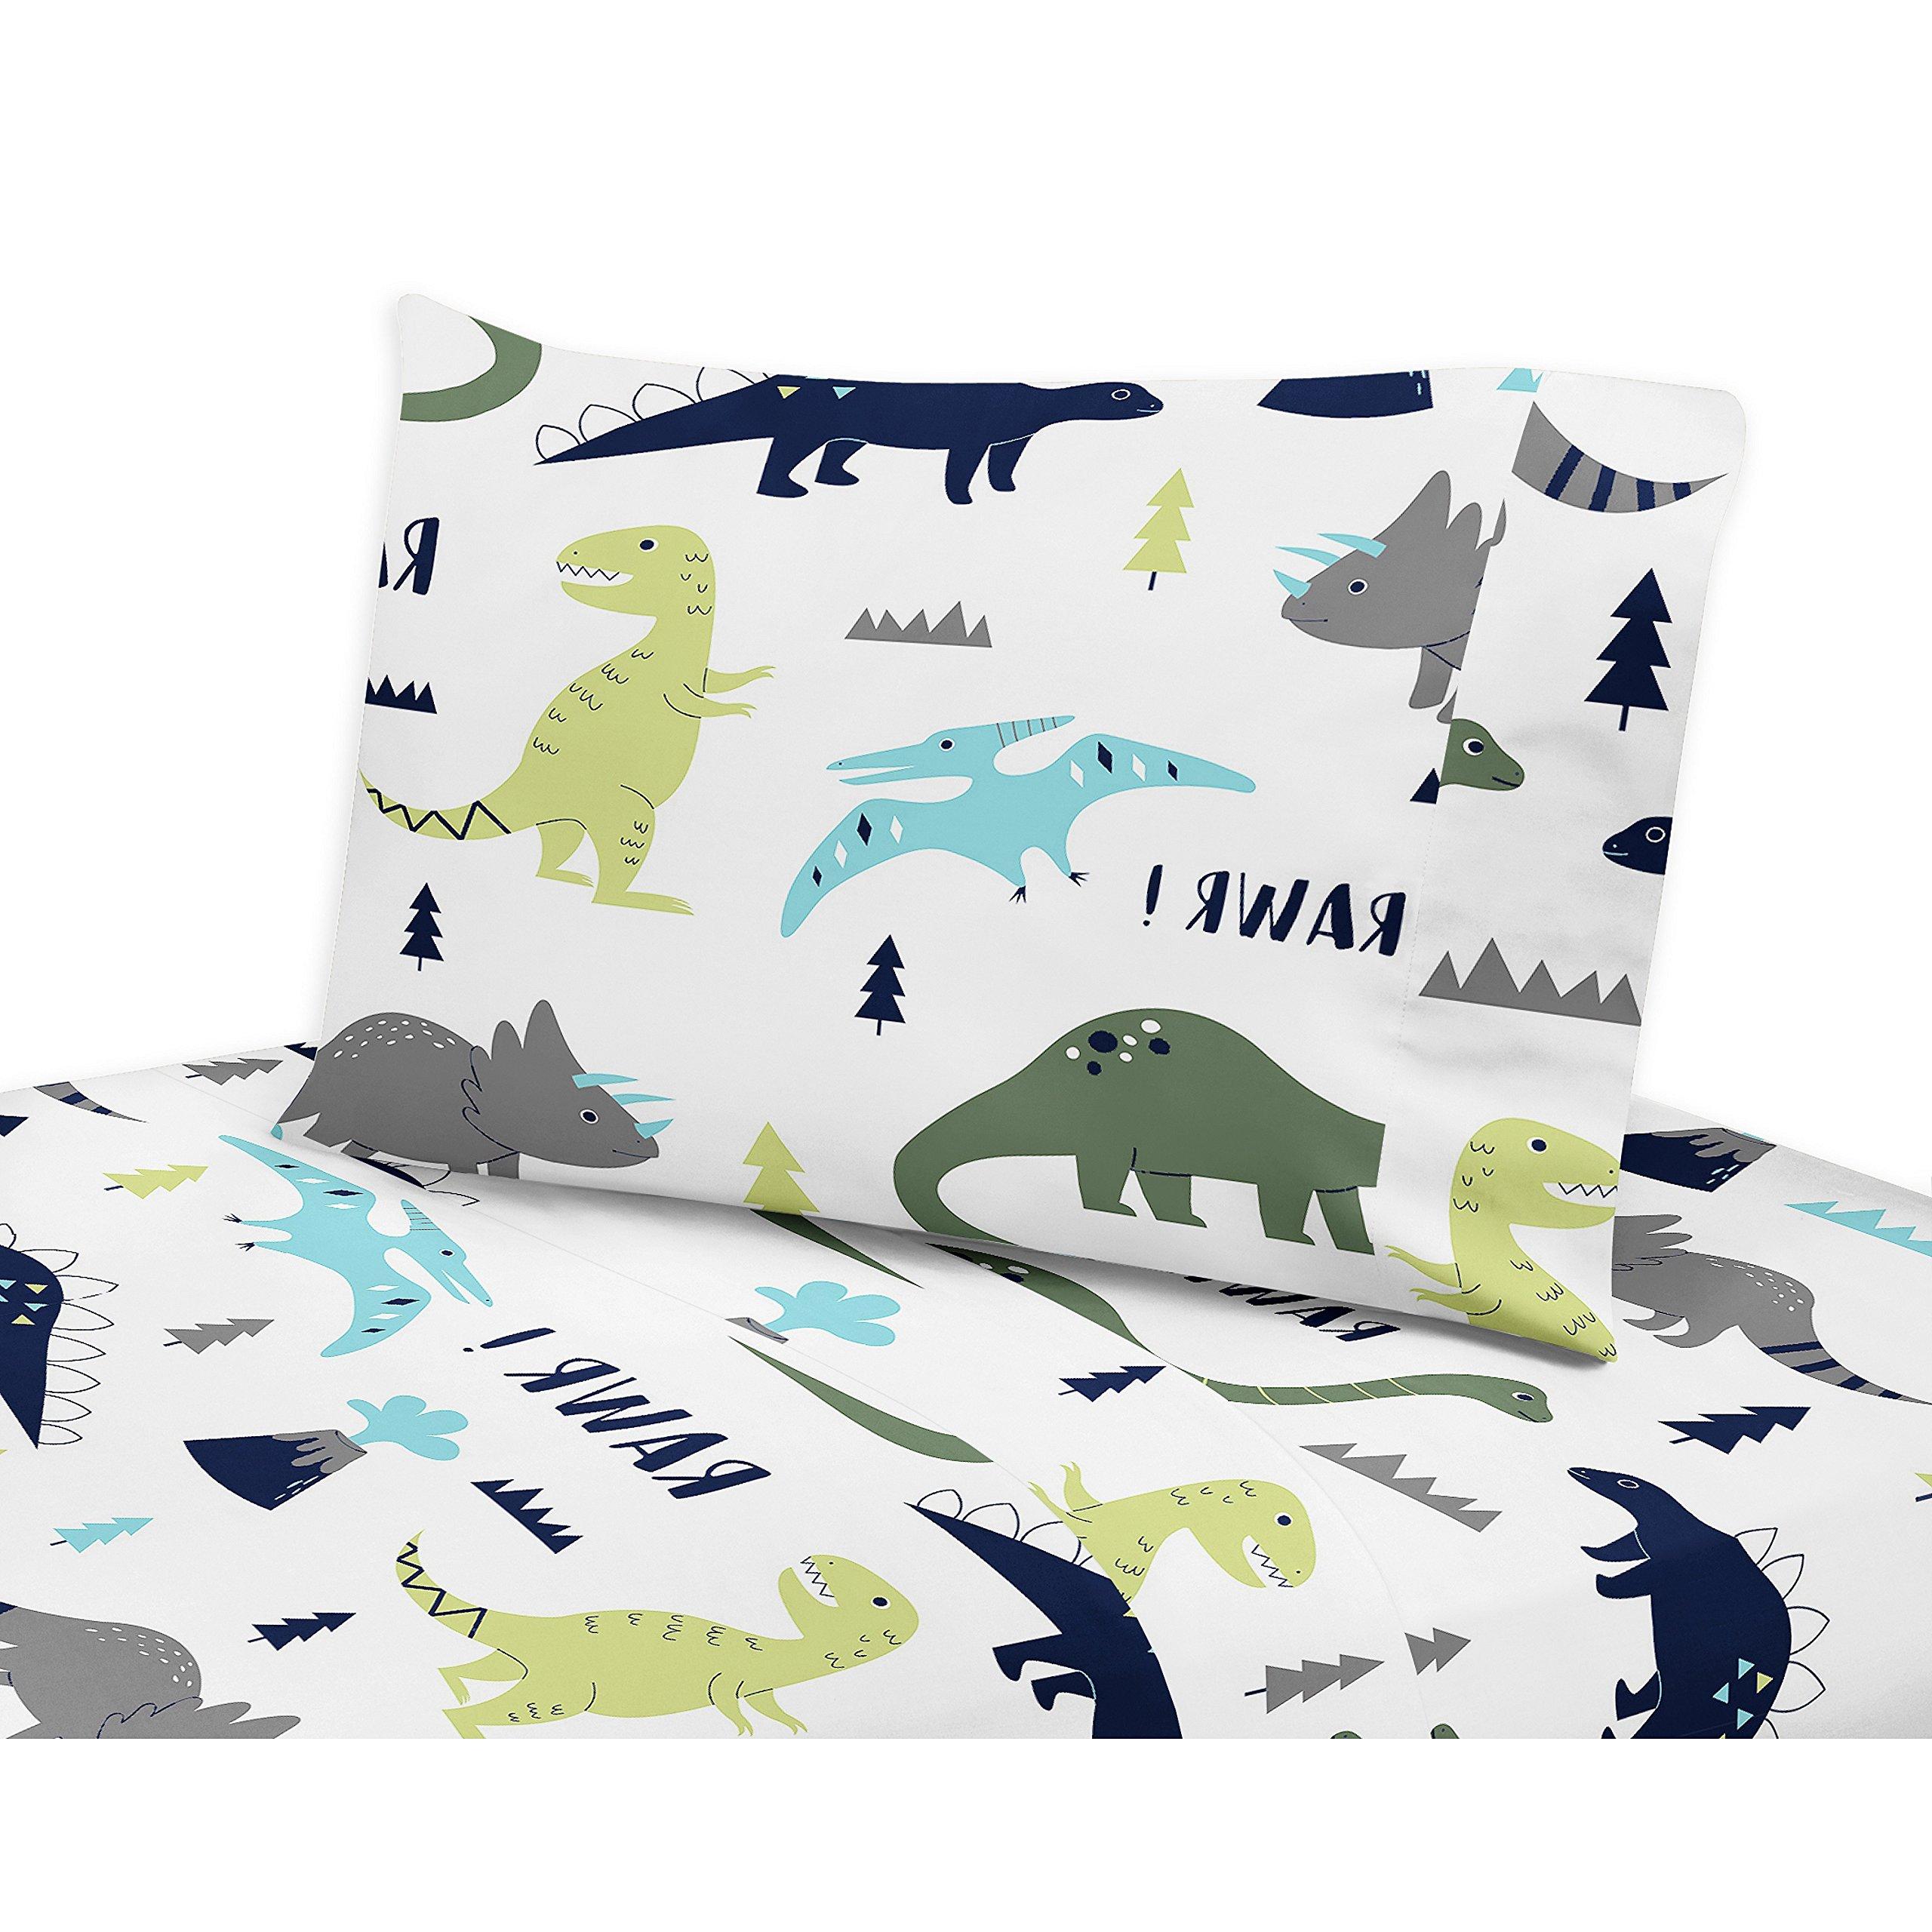 4 Piece Rawring Mod Dinosaur Patterned Sheet Set Queen Size, Featuring Printed Bold Vibrant Dinosaurs Bedding, Extinct Nature Animals, Safari Cute Dino Figure Wildlife Jungle Kids Bedroom, Multicolor